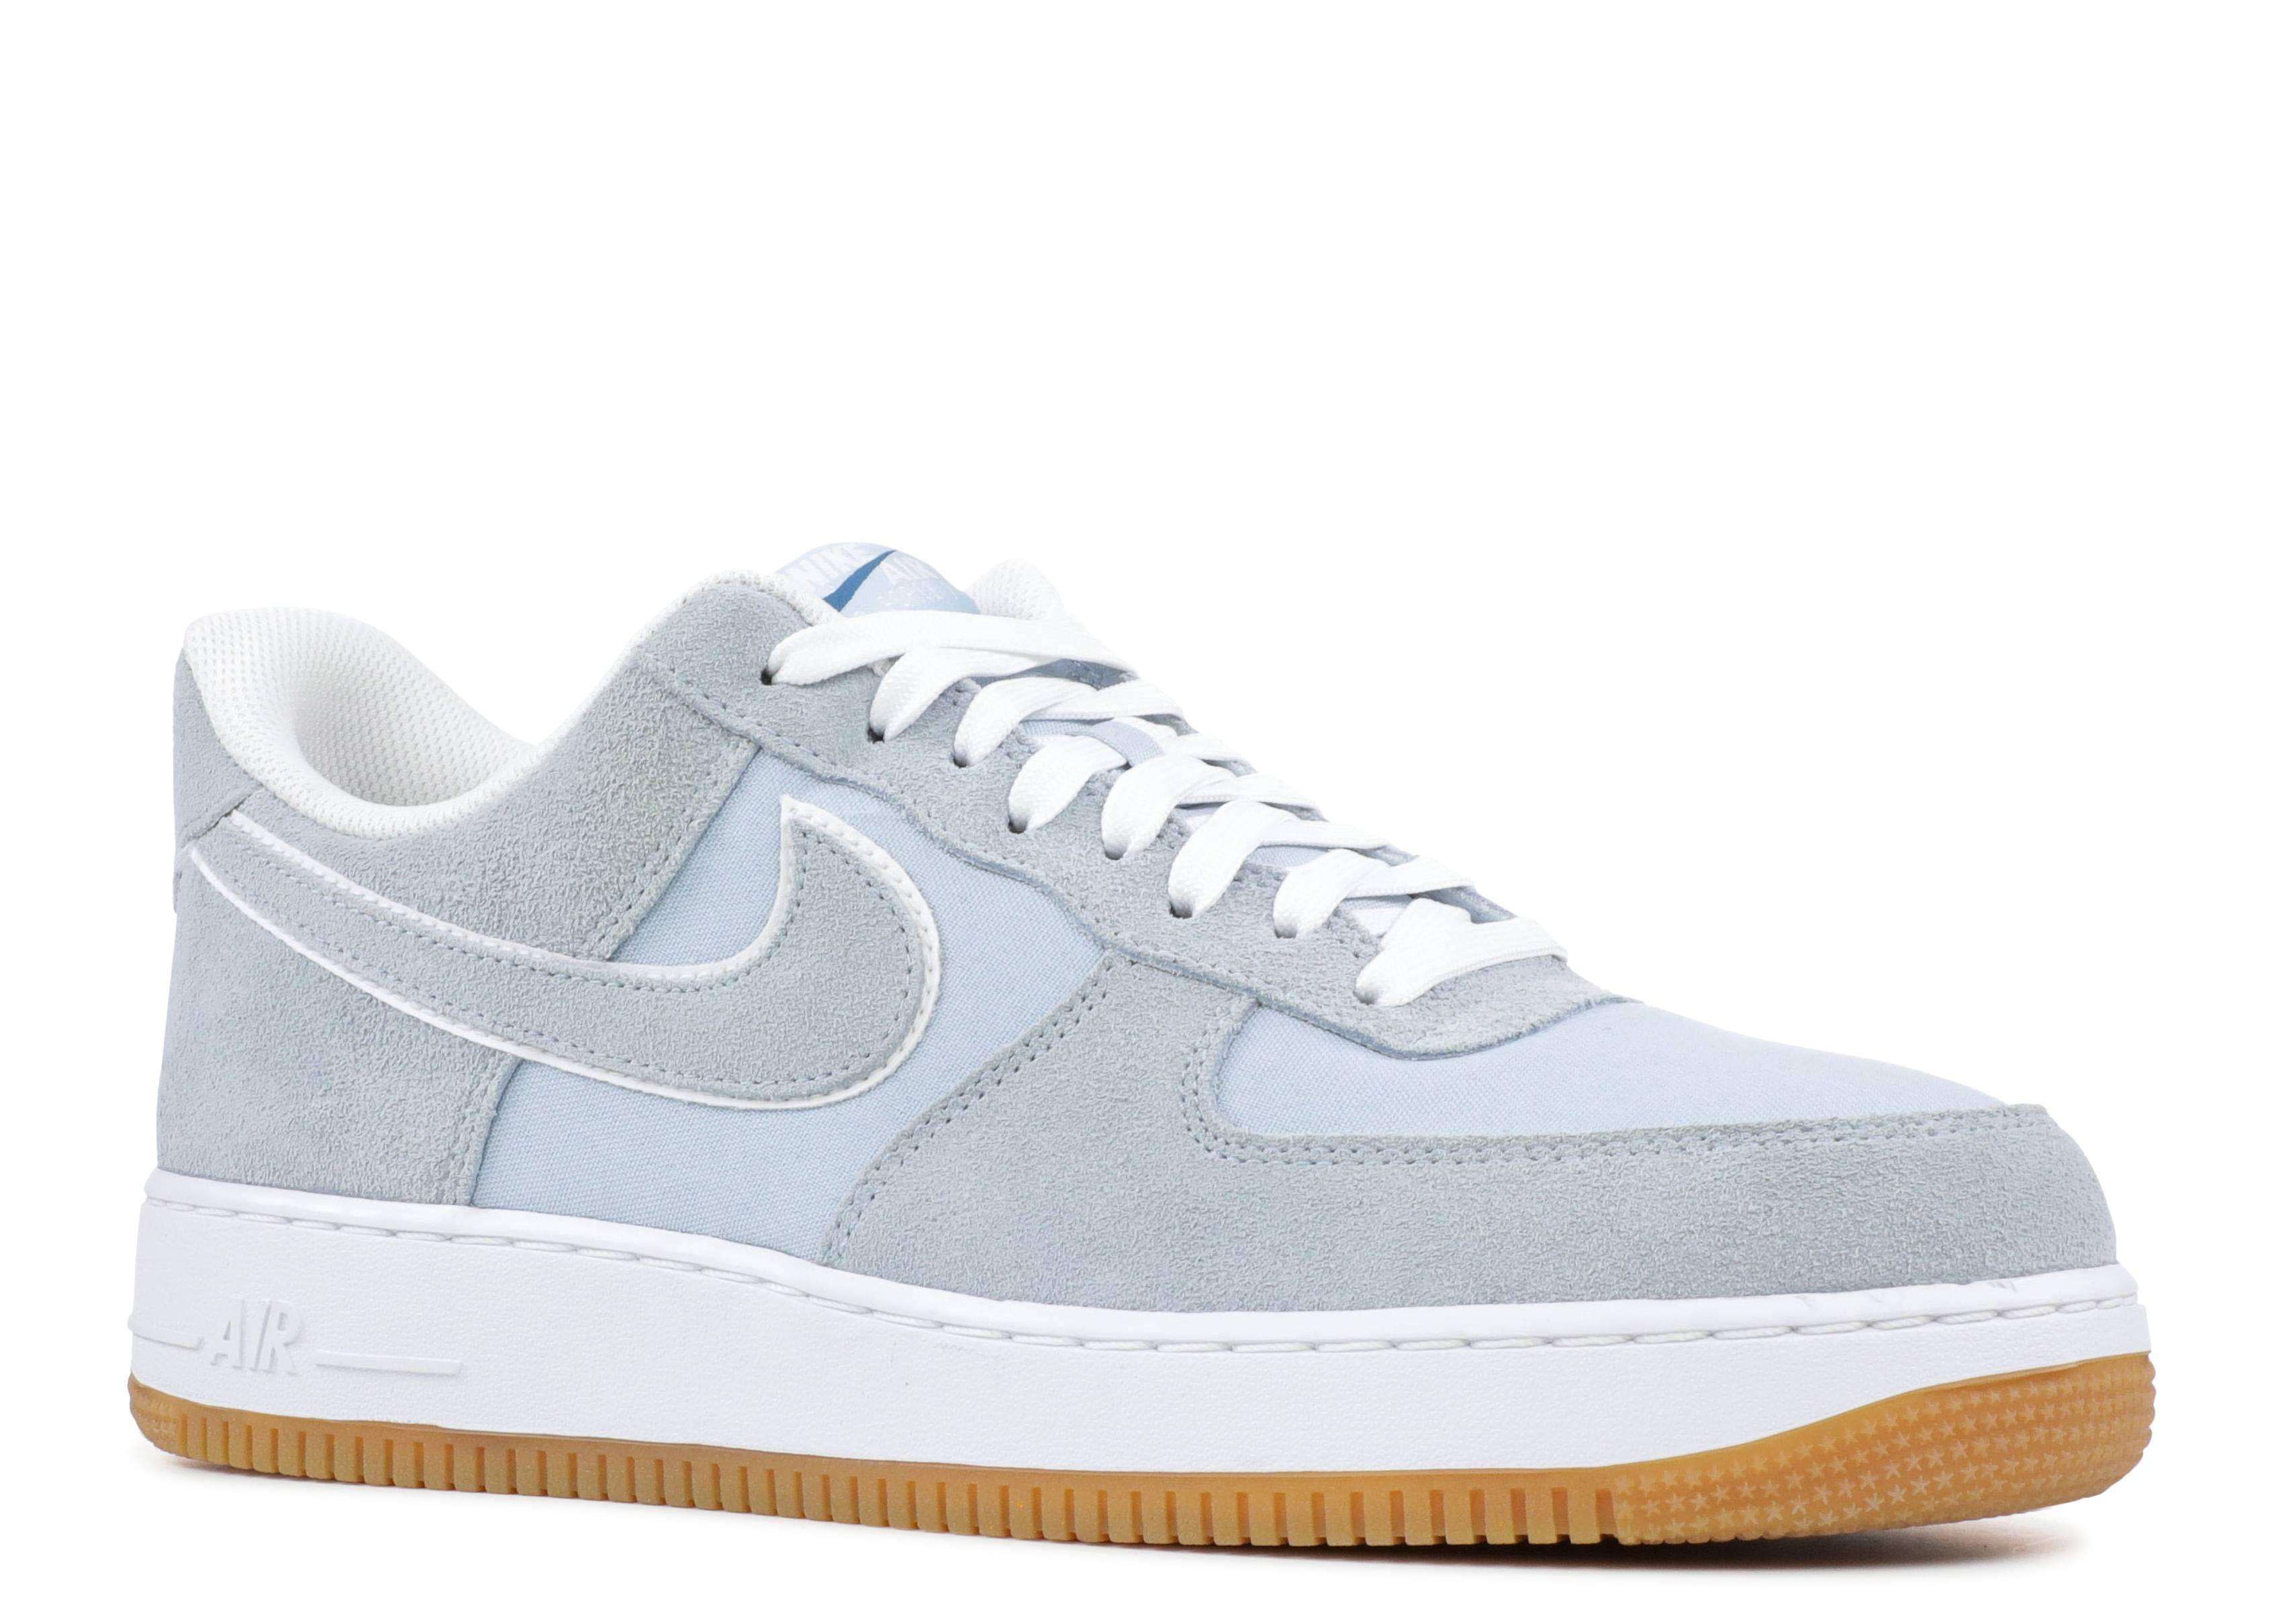 pretty nice e5790 d7bde Air Force 1  07 - Nike - 315122 422 - lt armory blue lt armory blue    Flight Club